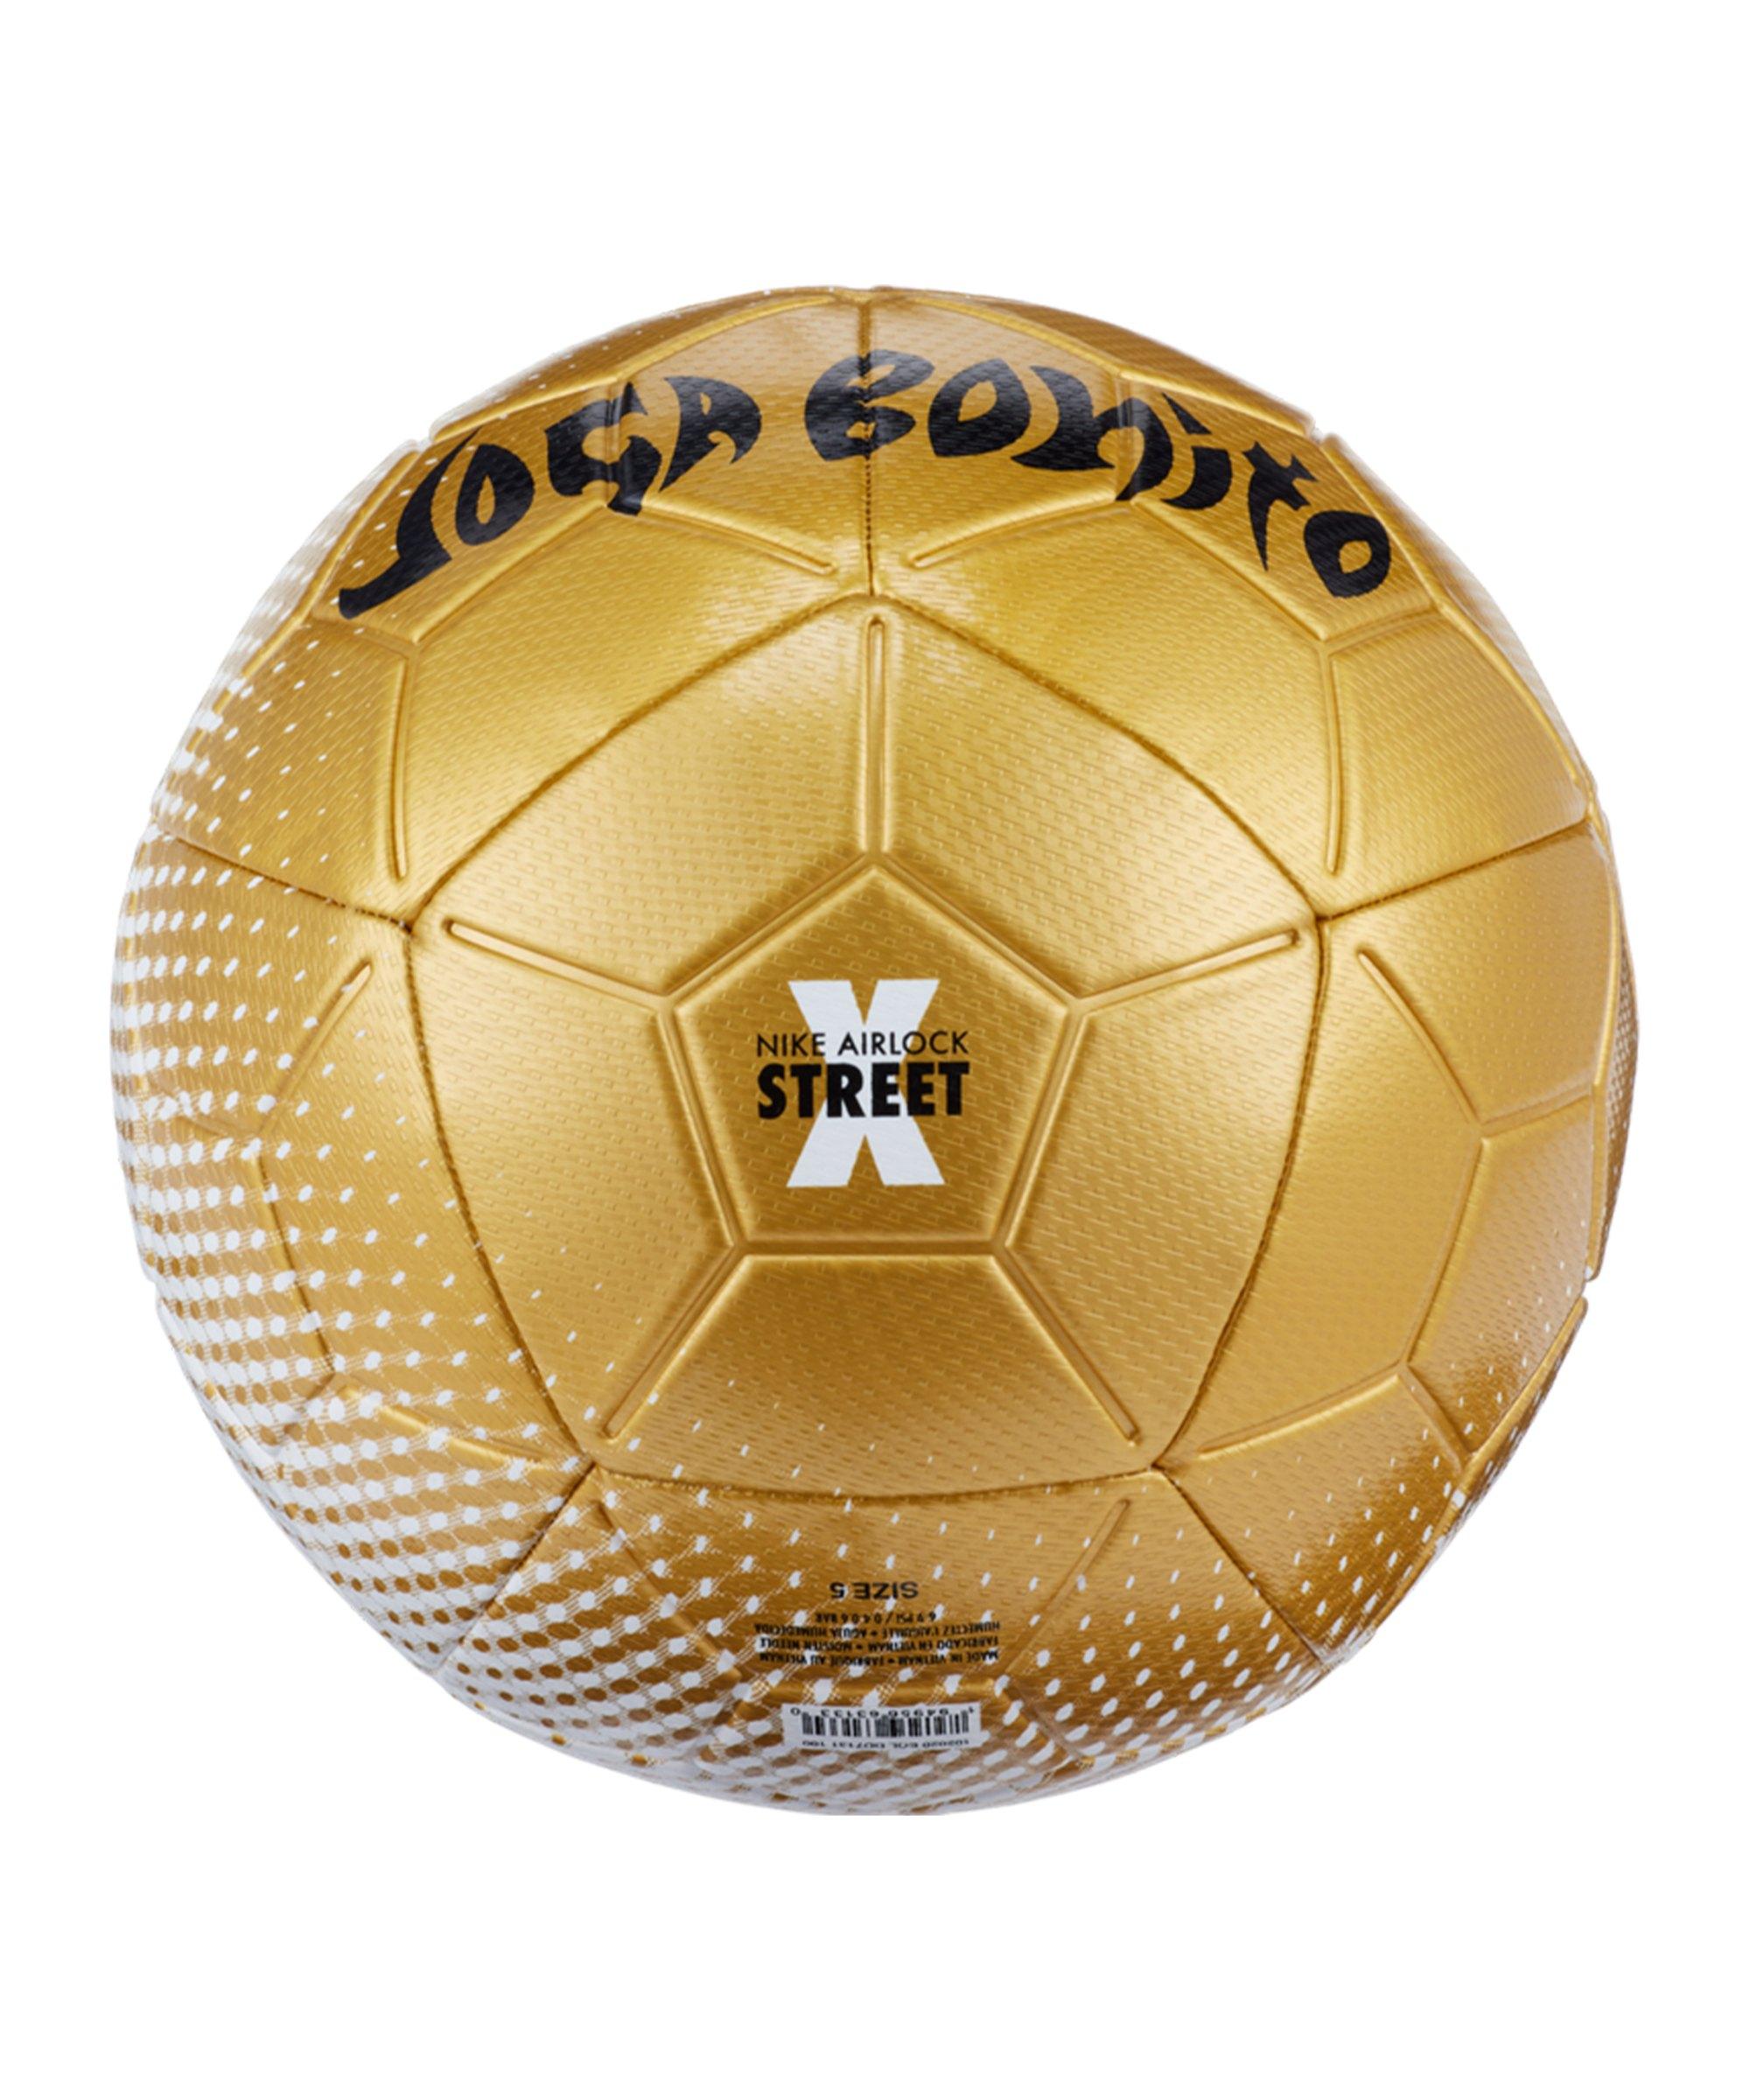 Nike Airlock Street X Joga Bonito Schwarz F100 Equipment Fussball